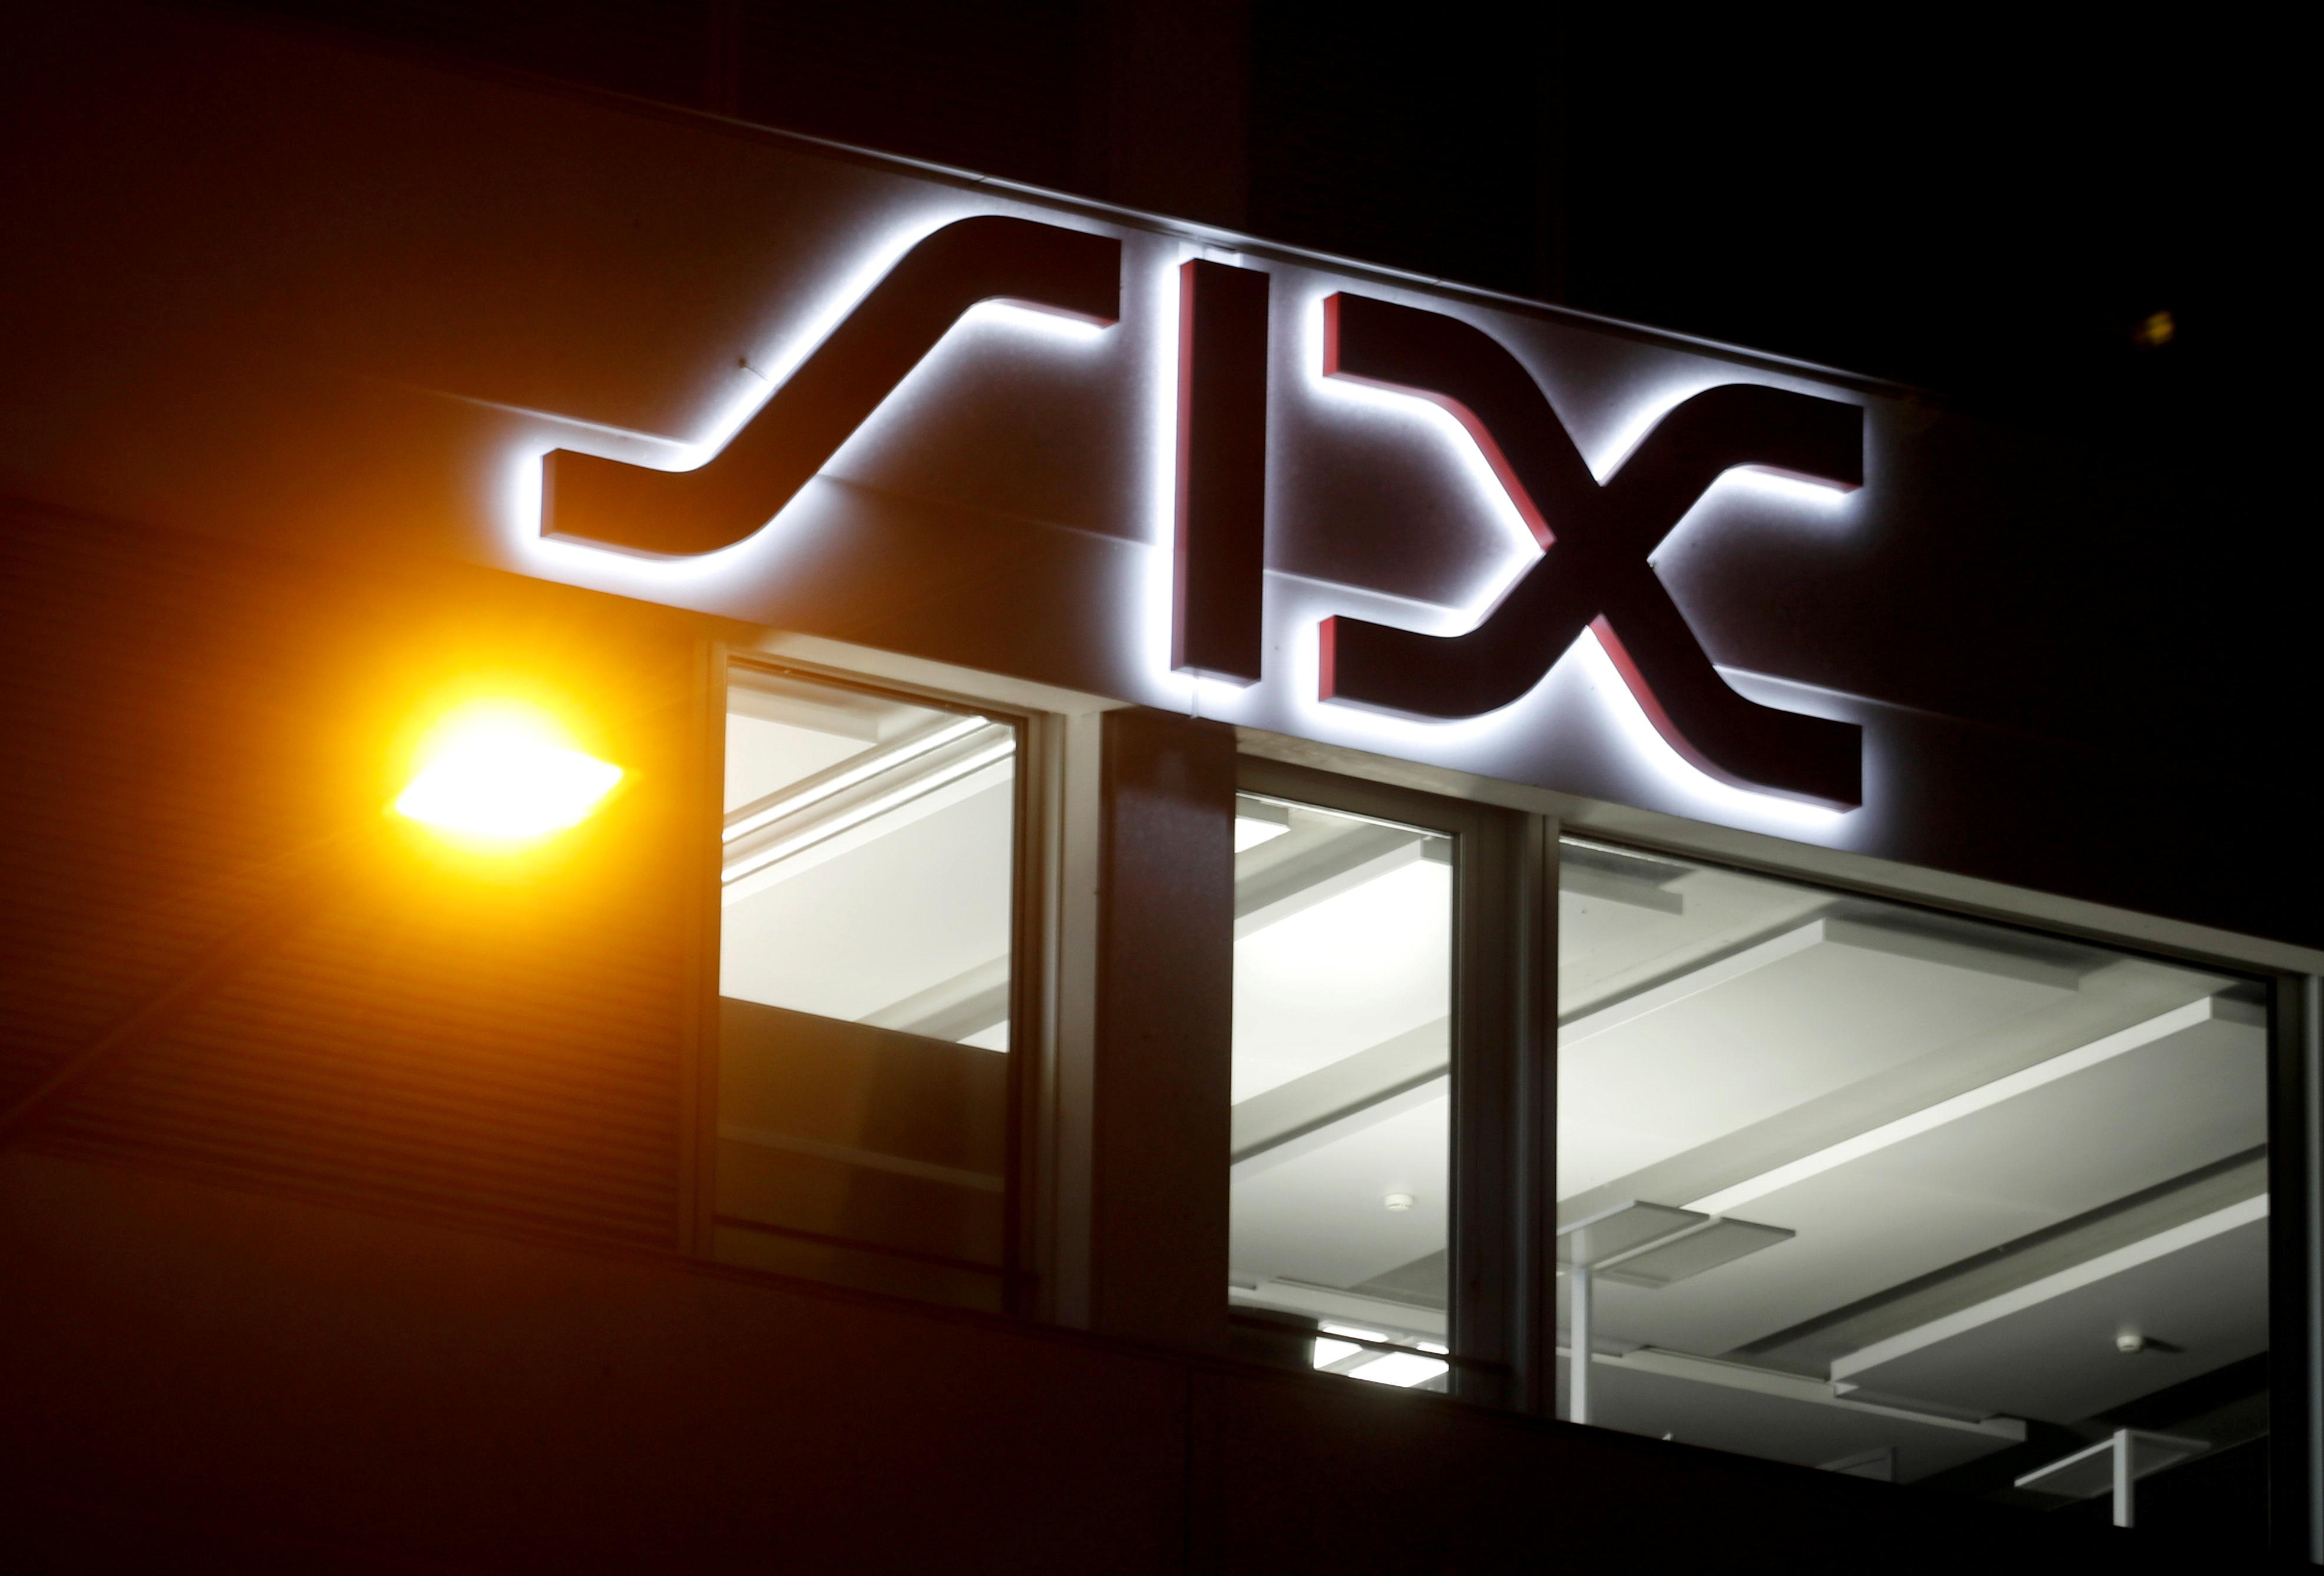 A logo logo is seen at the seat of Swiss stock exchange operator SIX Group in Zurich, Switzerland June 17, 2019. REUTERS/Arnd Wiegmann